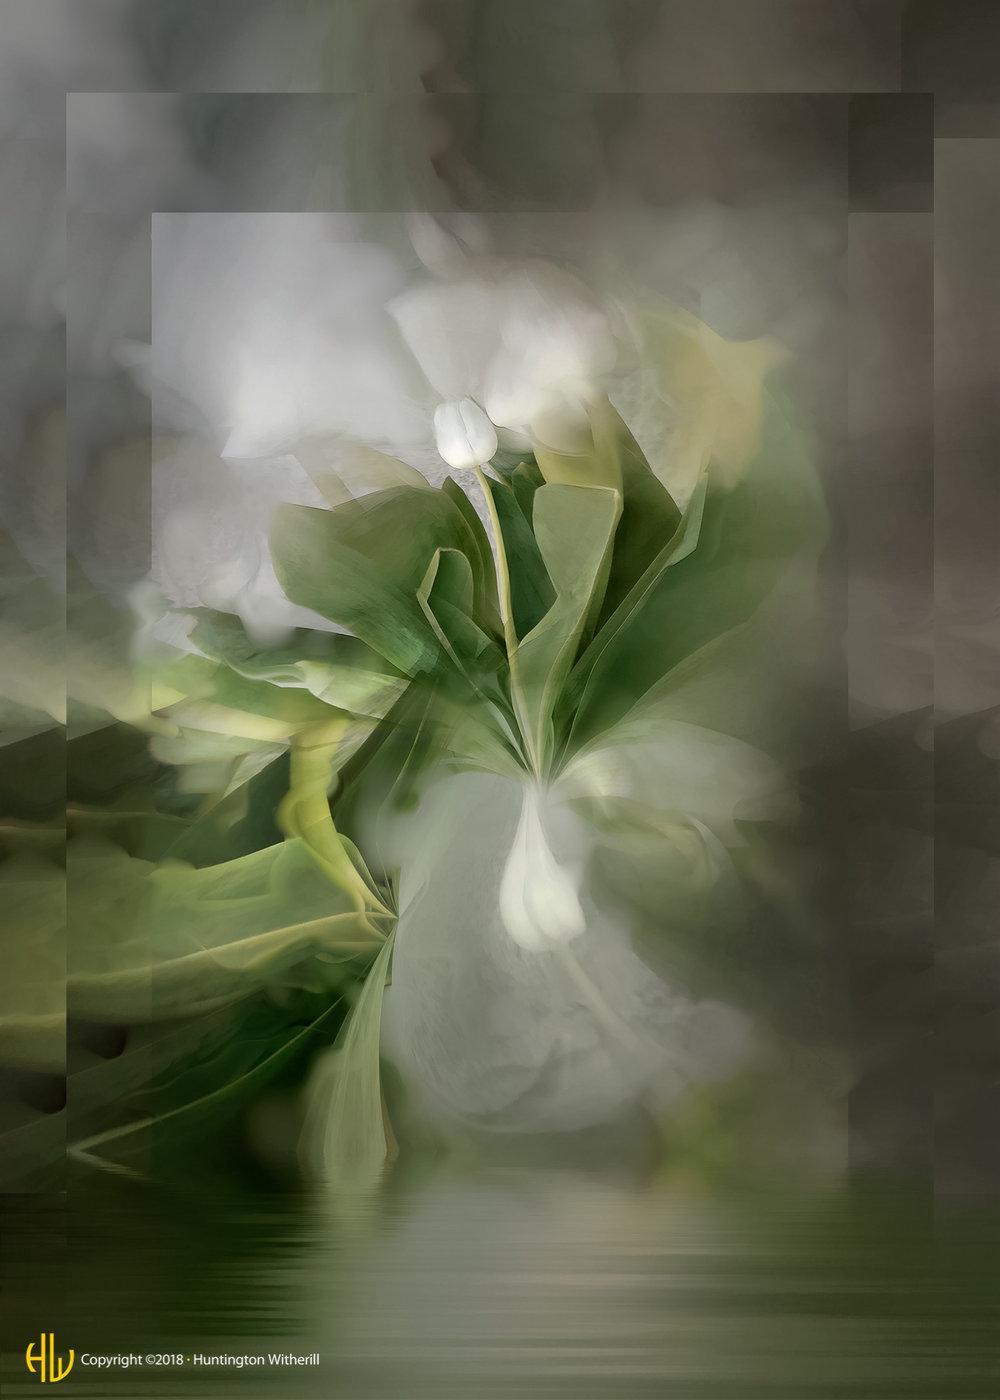 Tulips #53, 2005